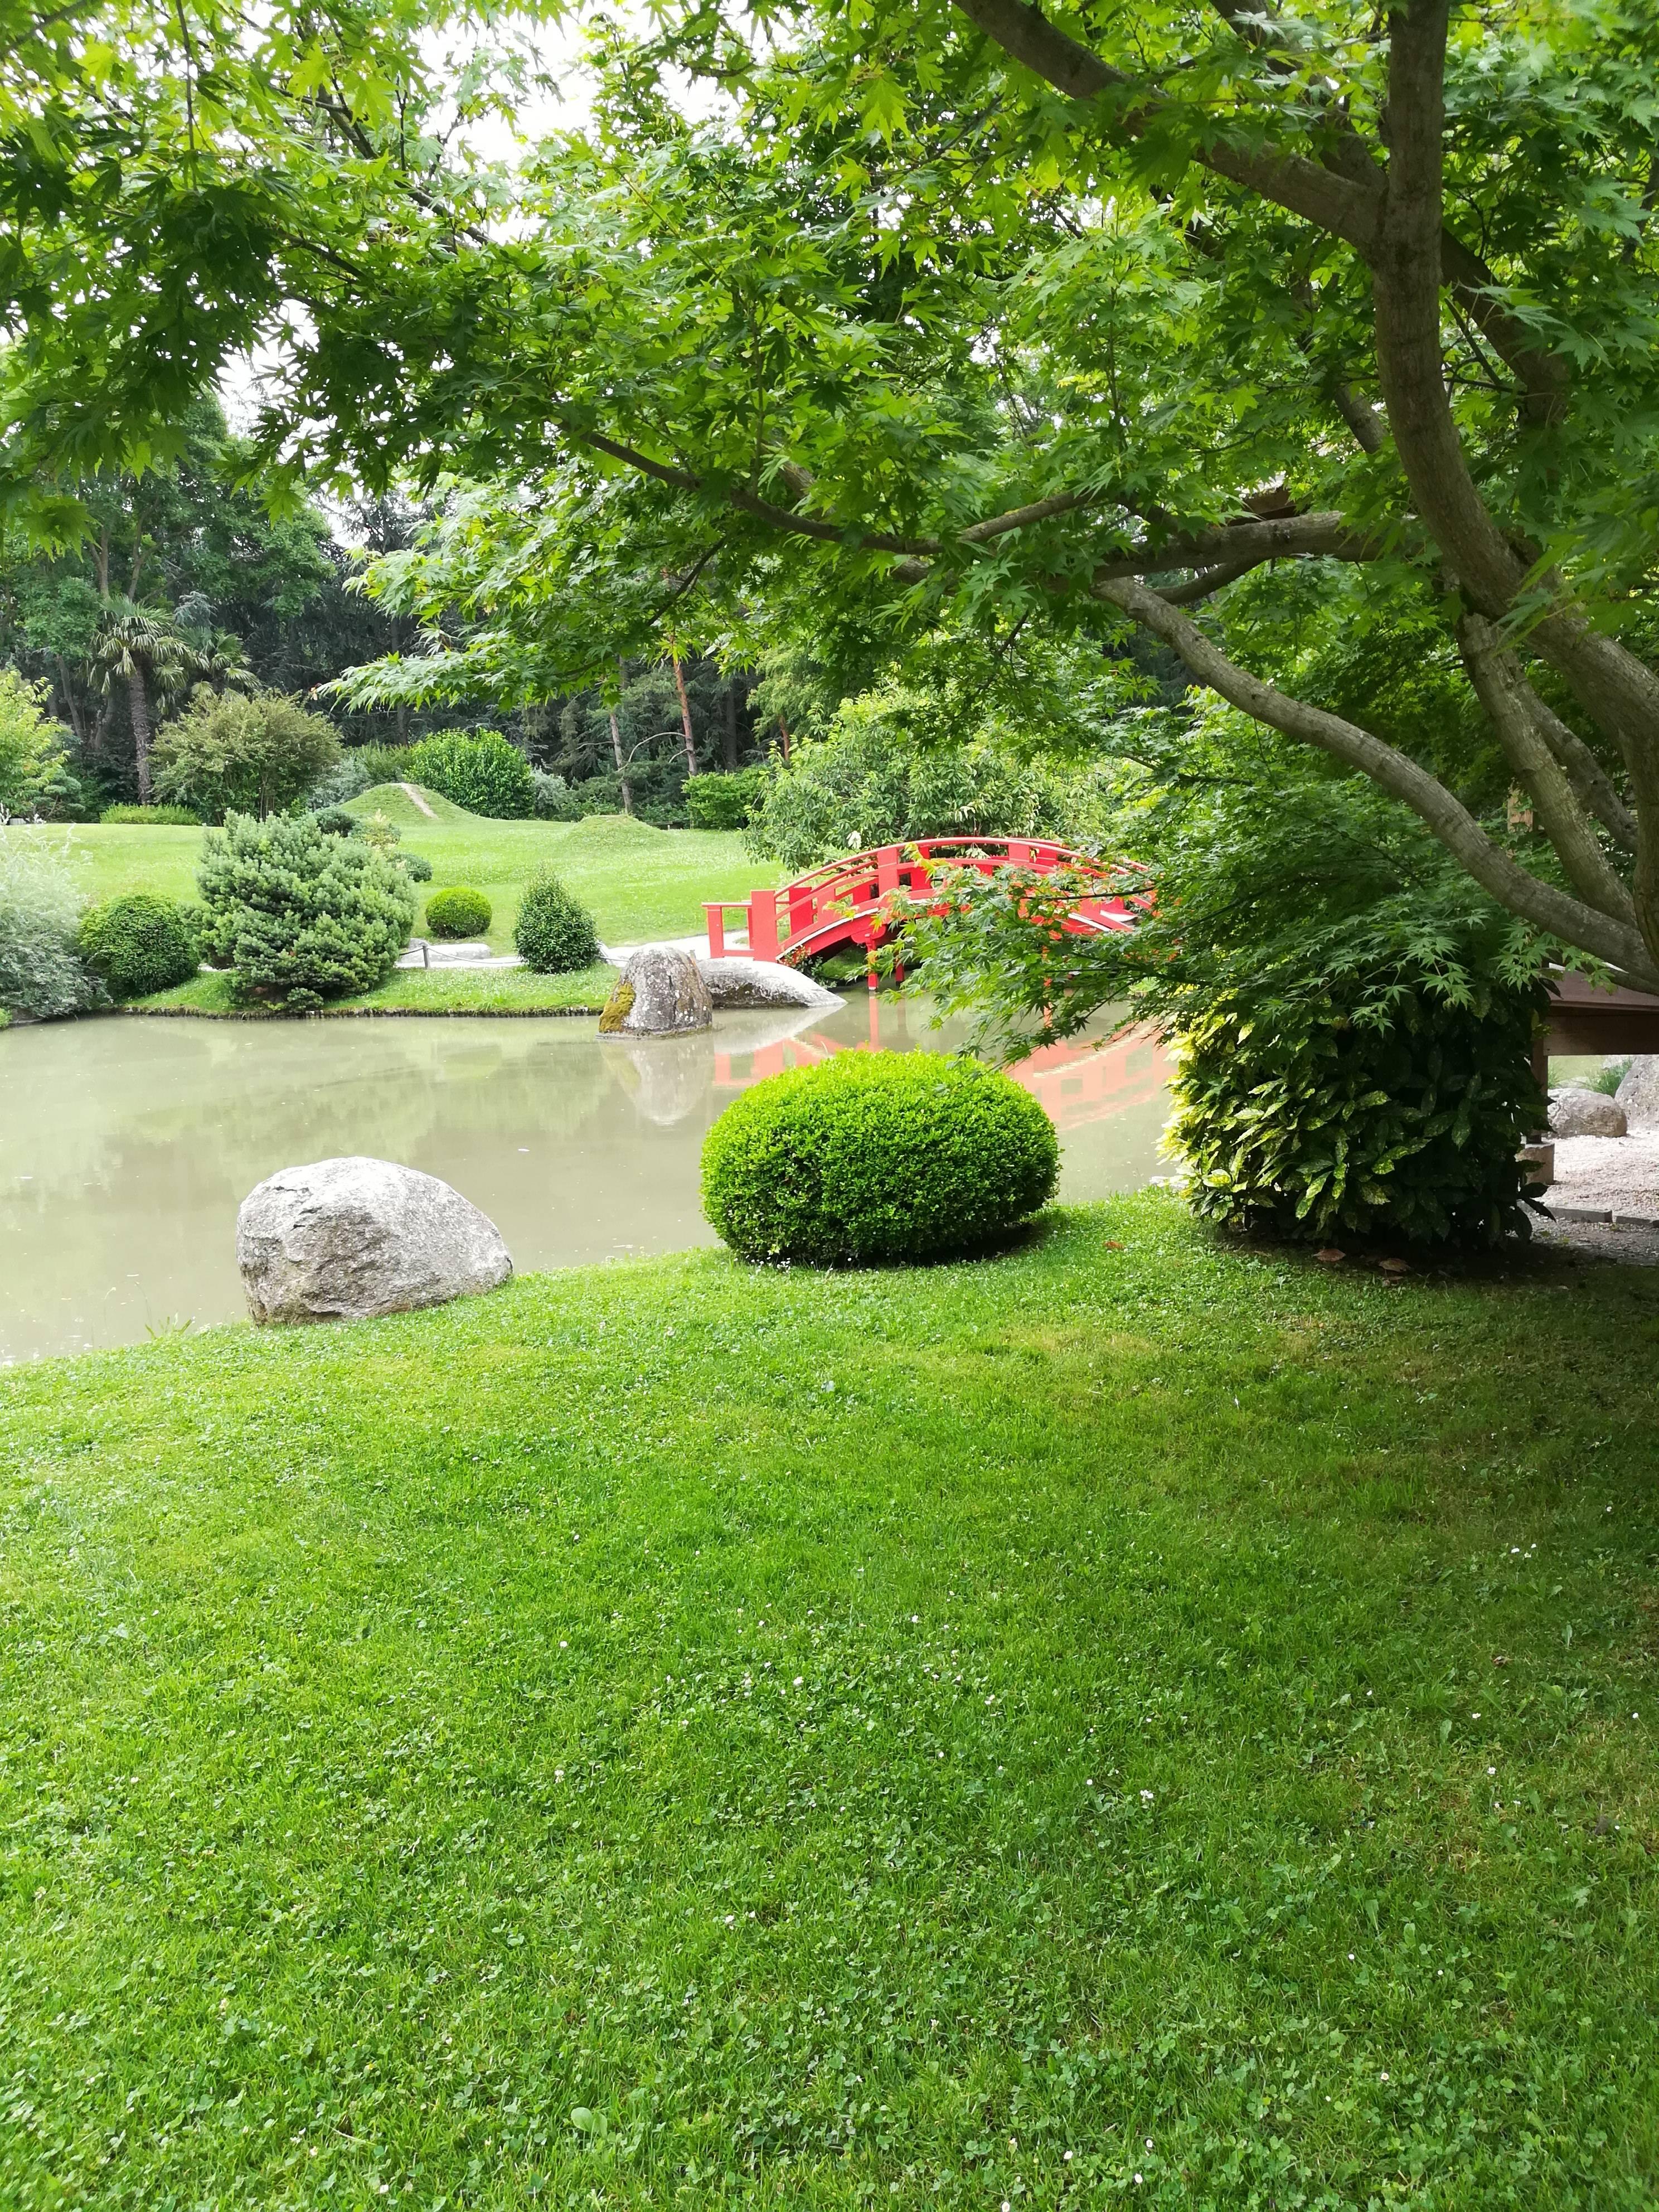 Photo 2: Jardin Japonais